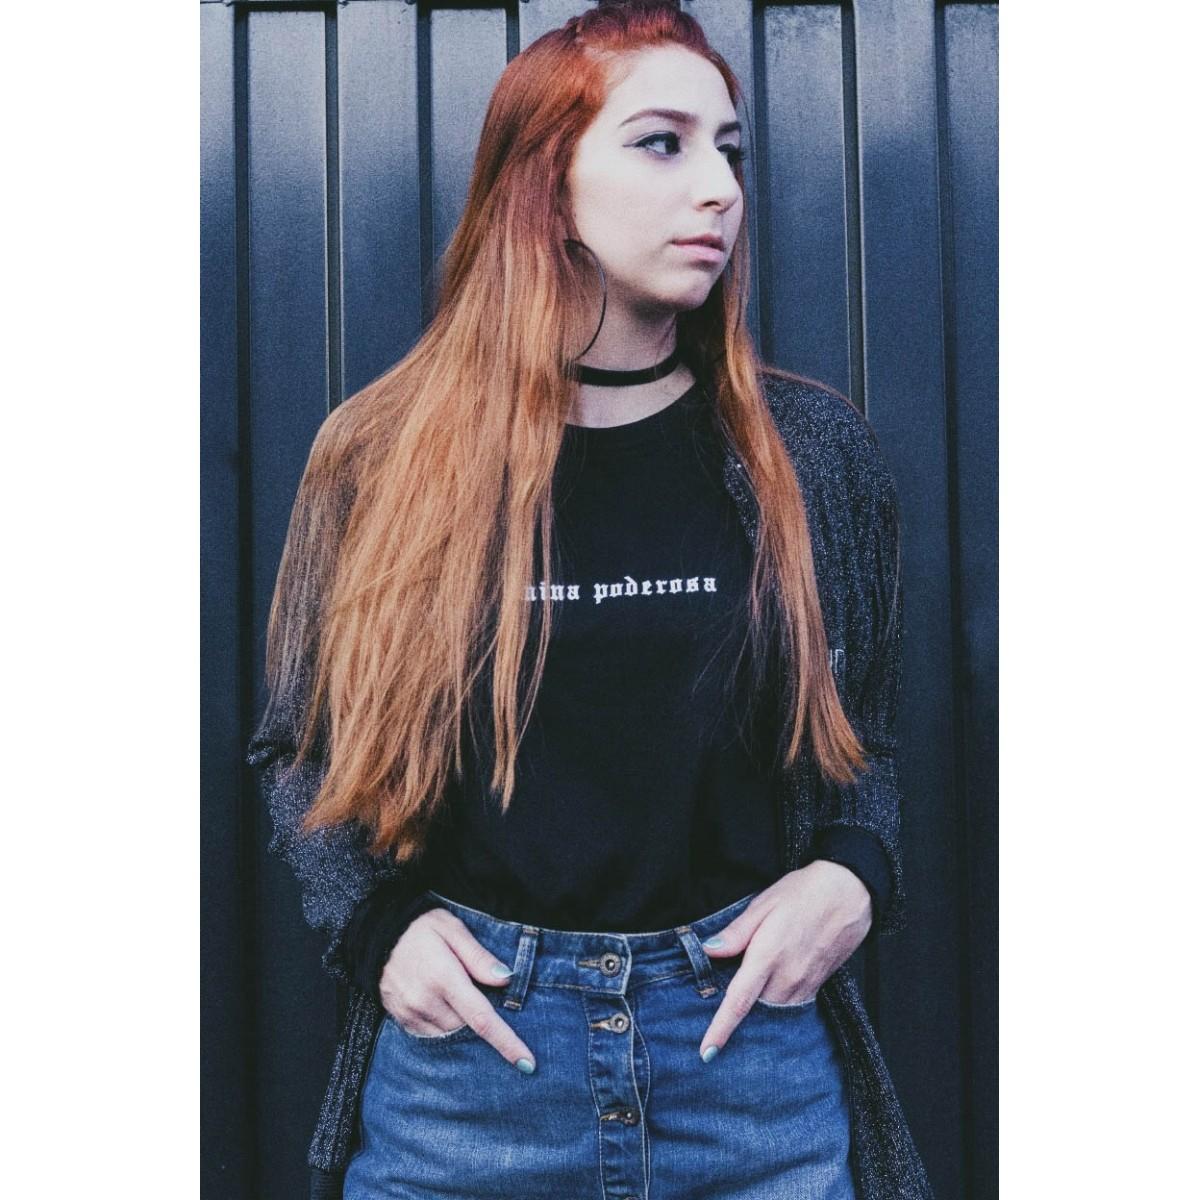 Camiseta Mina poderosa